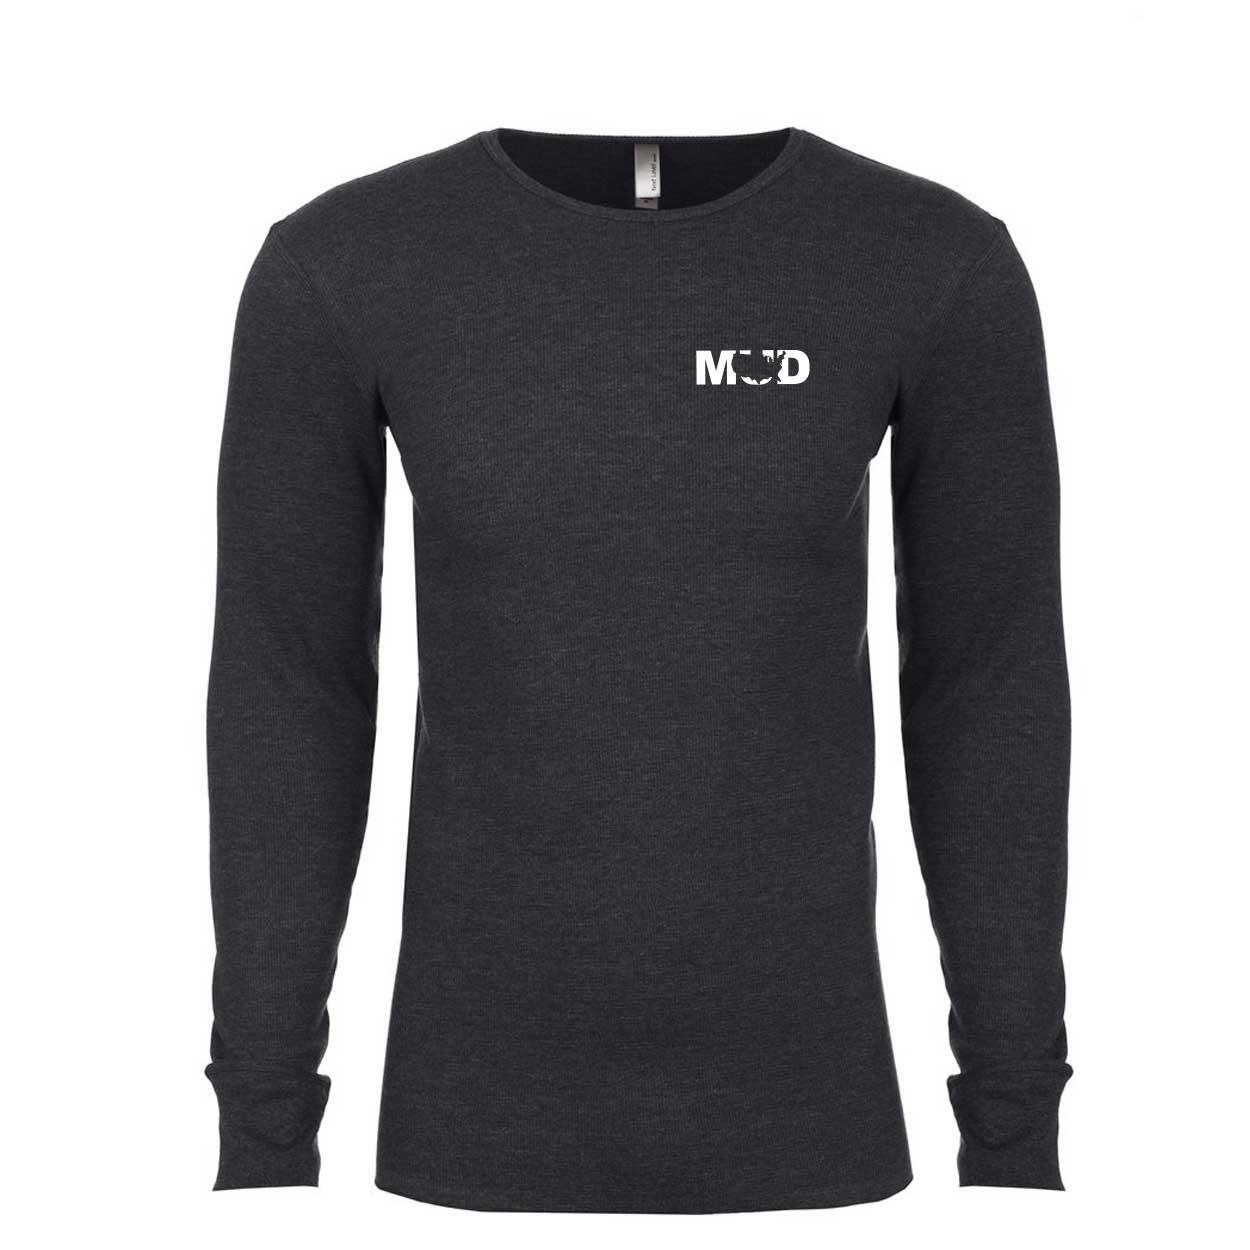 Mud United States Long Sleeve Thermal Shirt Heather Charcoal (White Logo)